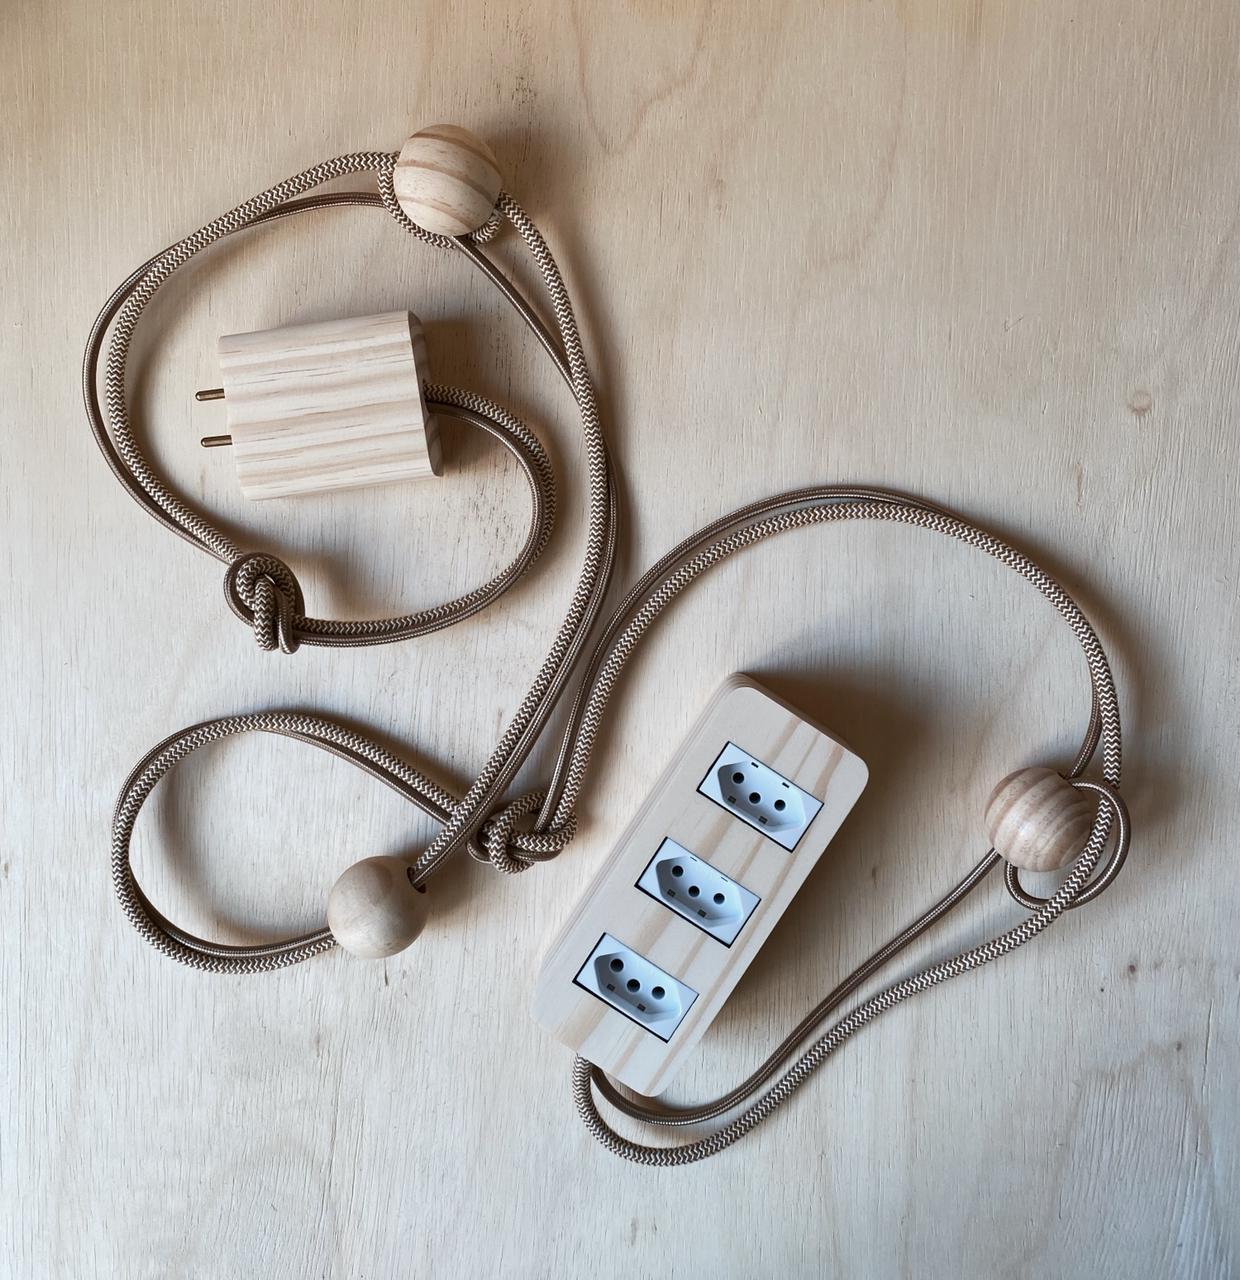 Prolunga Cable